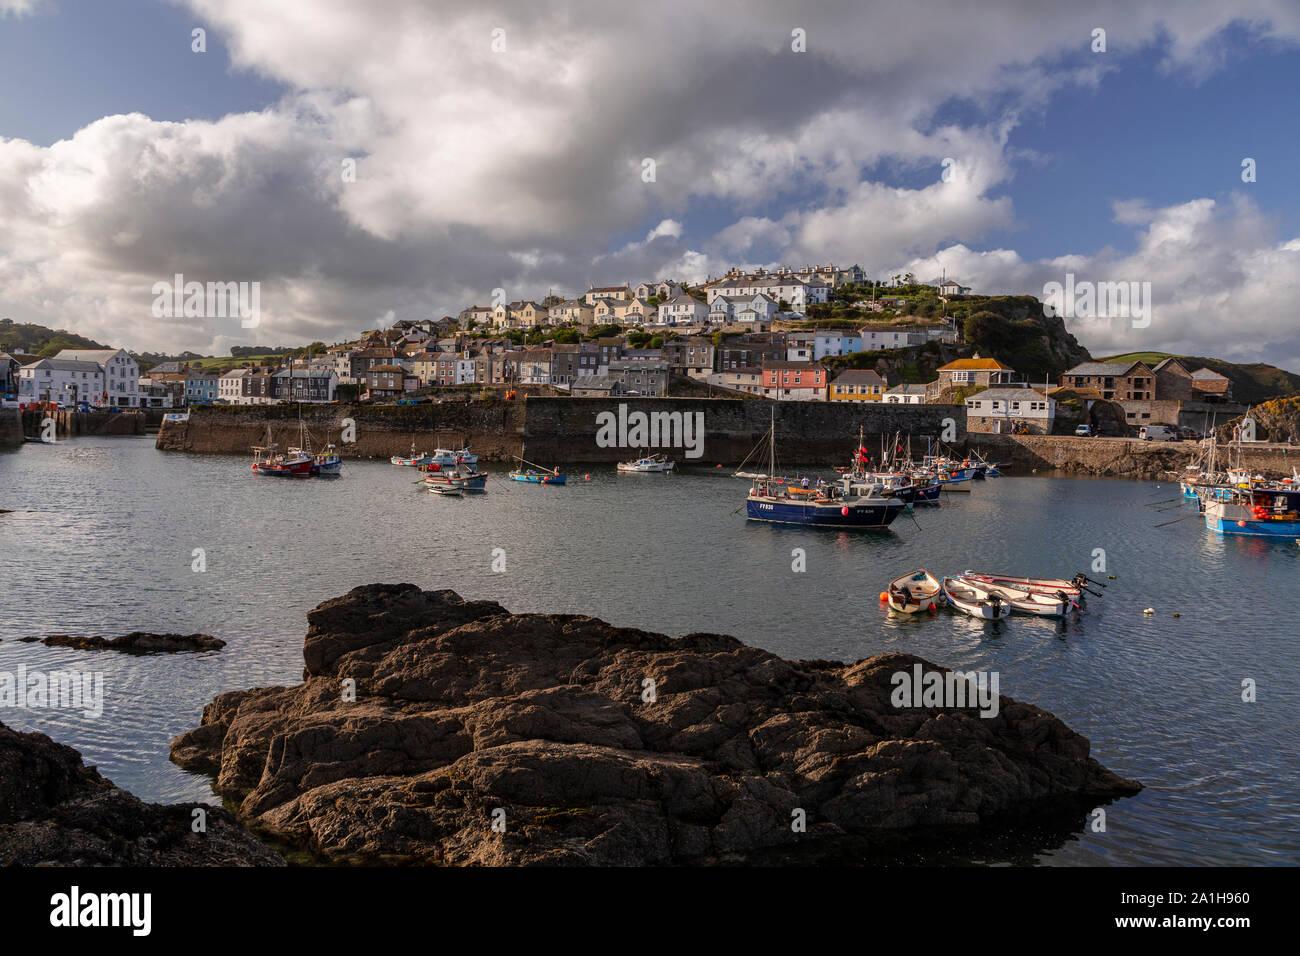 Mevagissey harbour, Cornwall, England Stock Photo